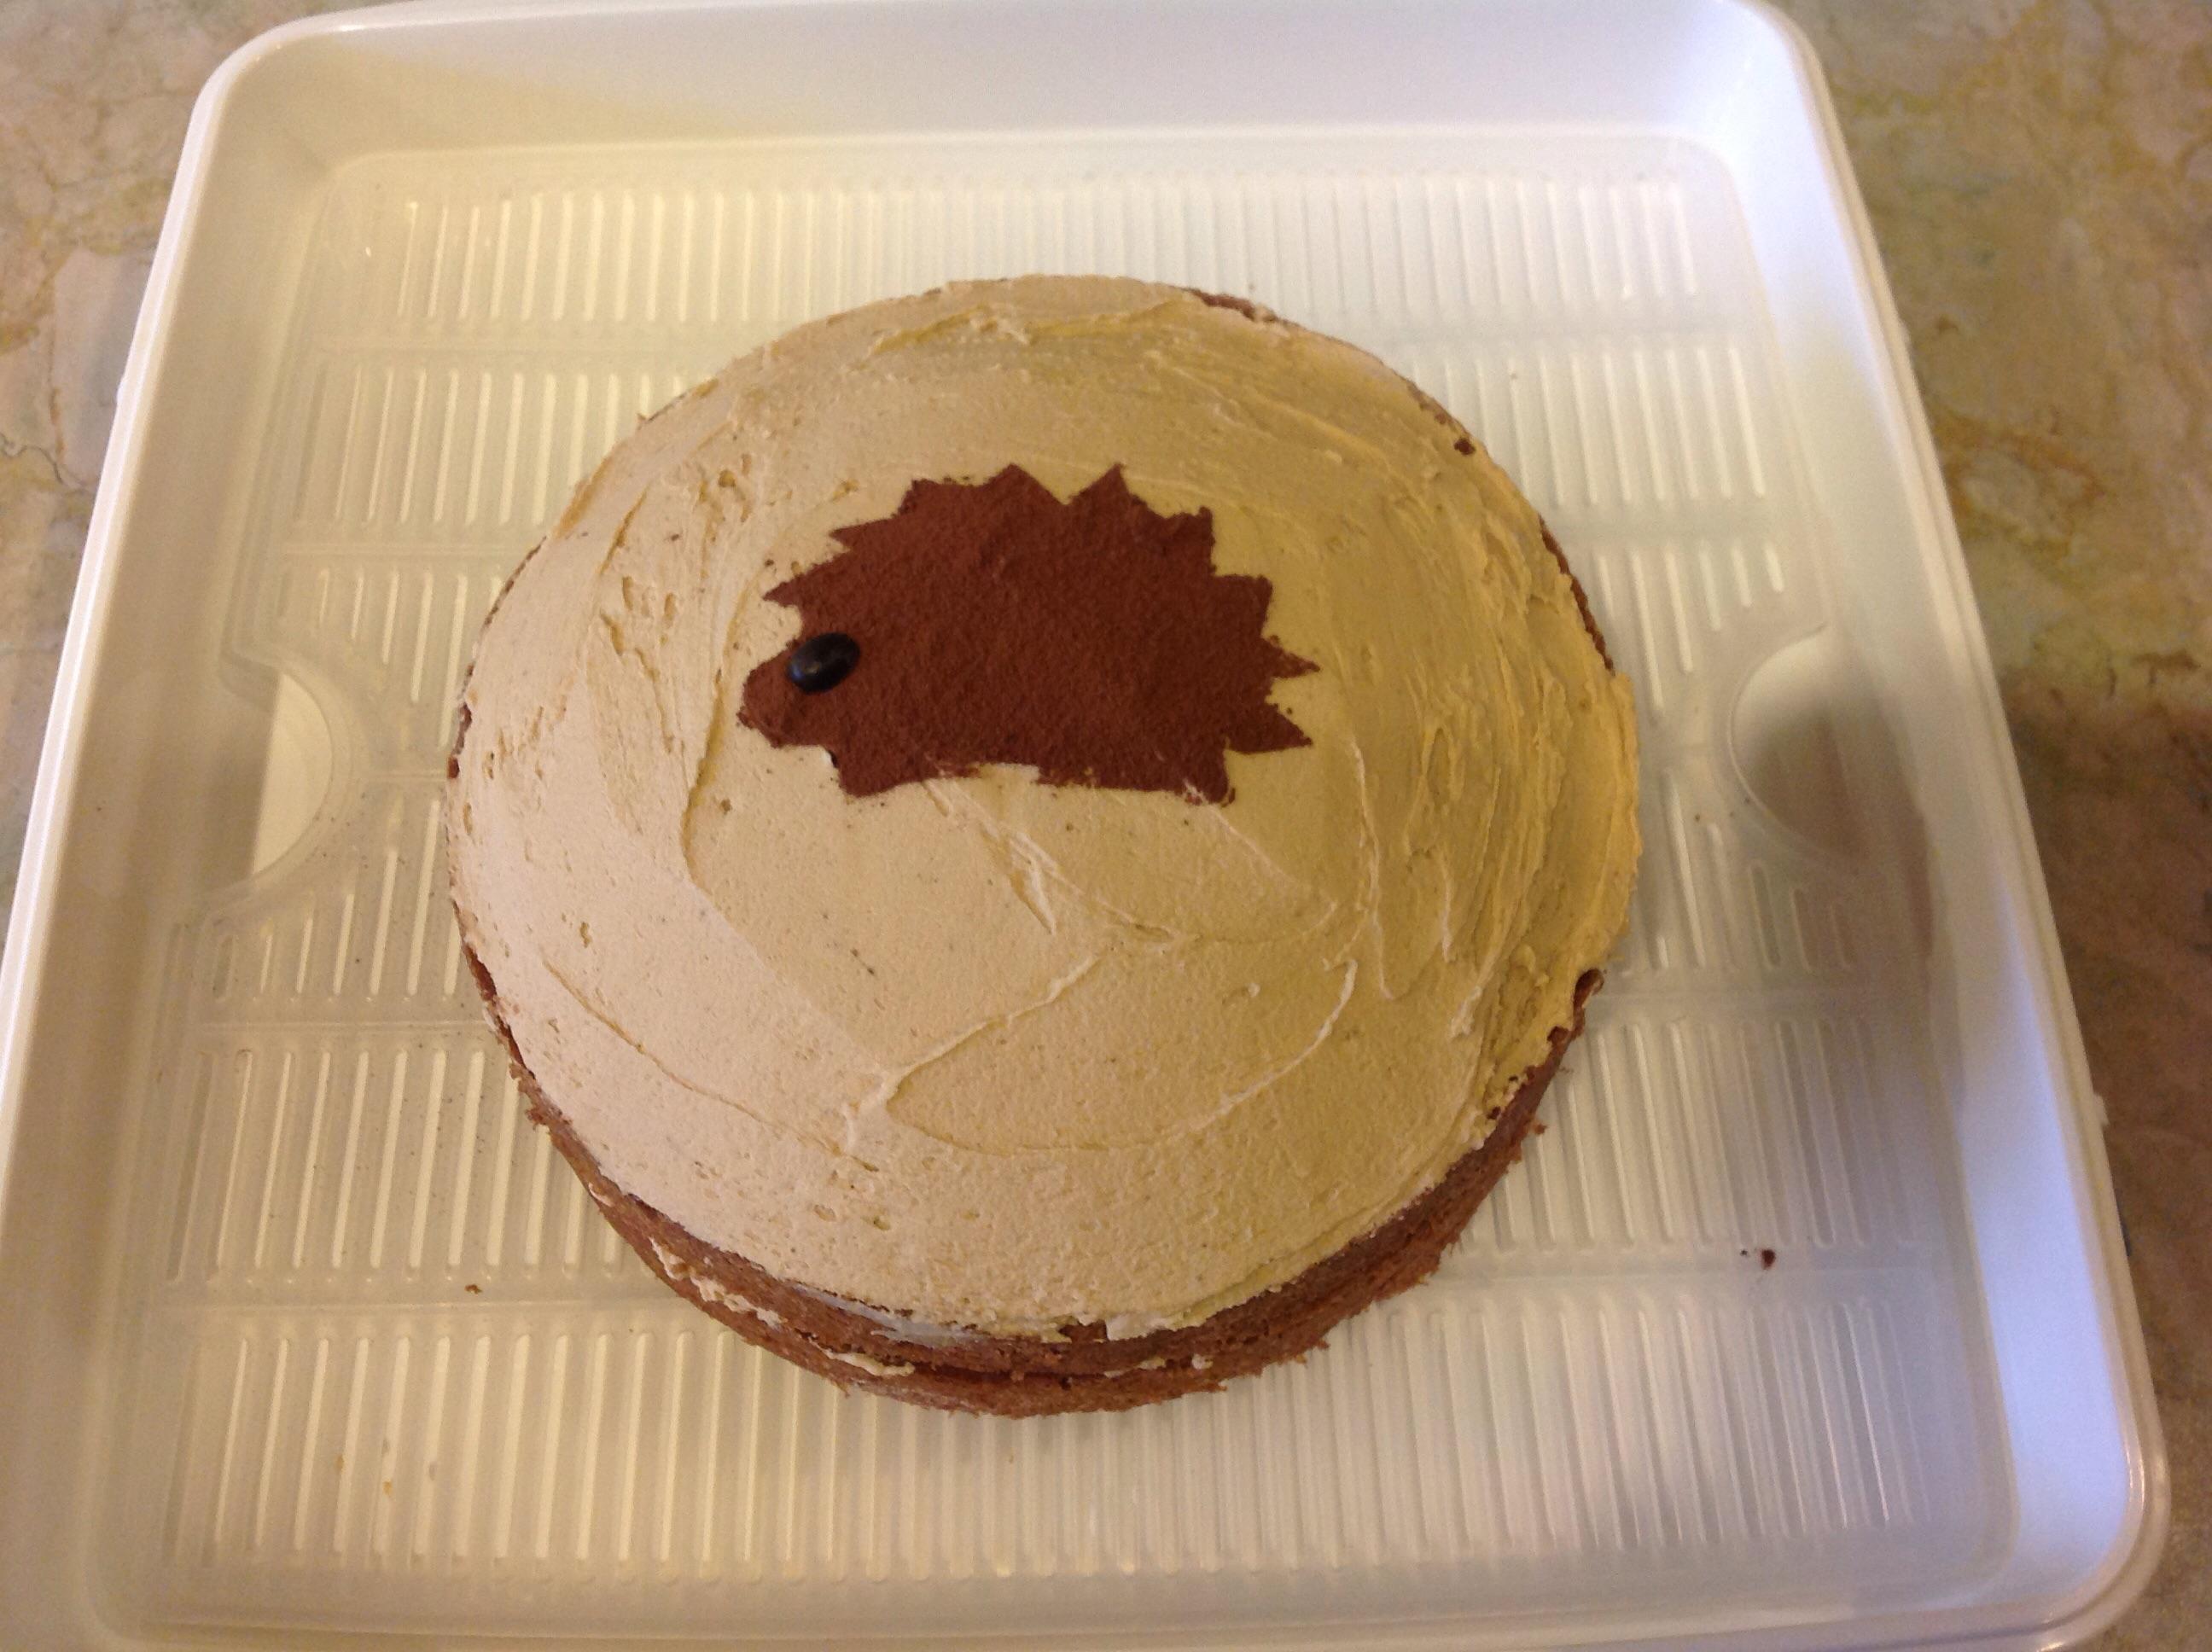 How Do You Make Coffee Cake Icing